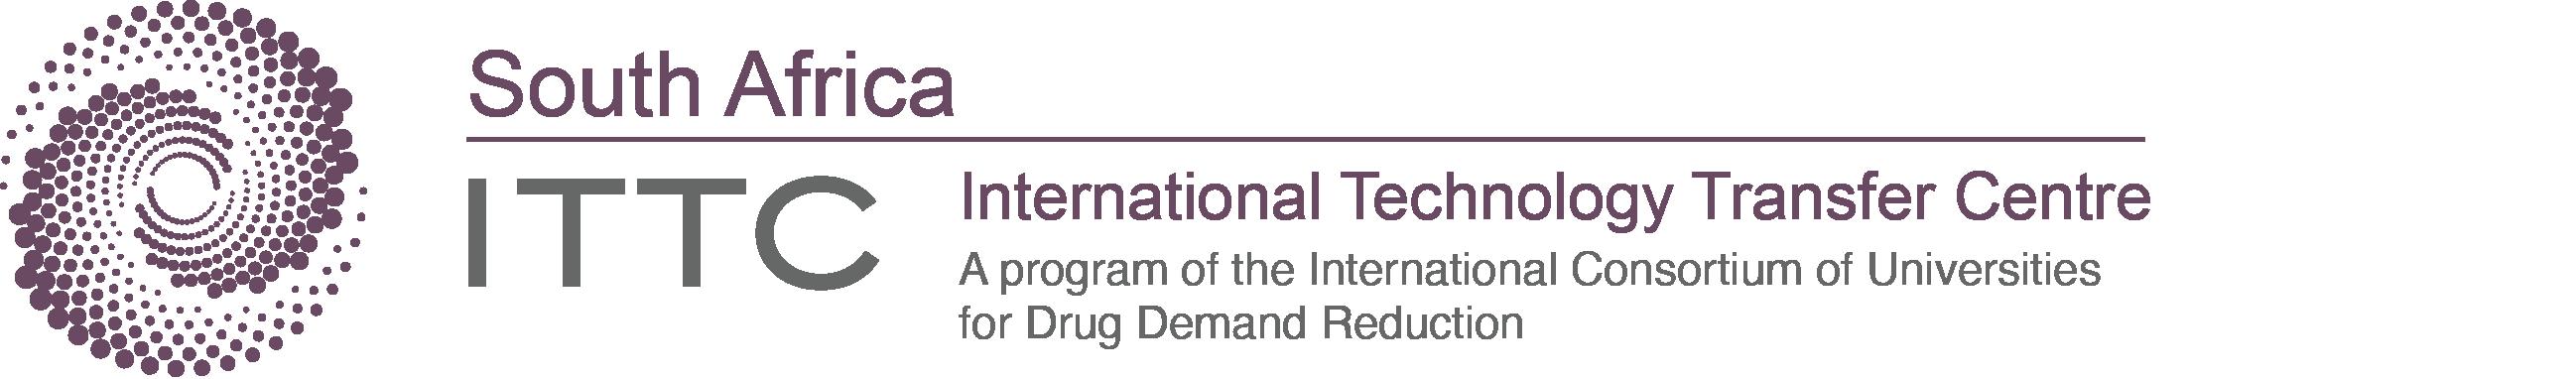 South Africa ITTC logo